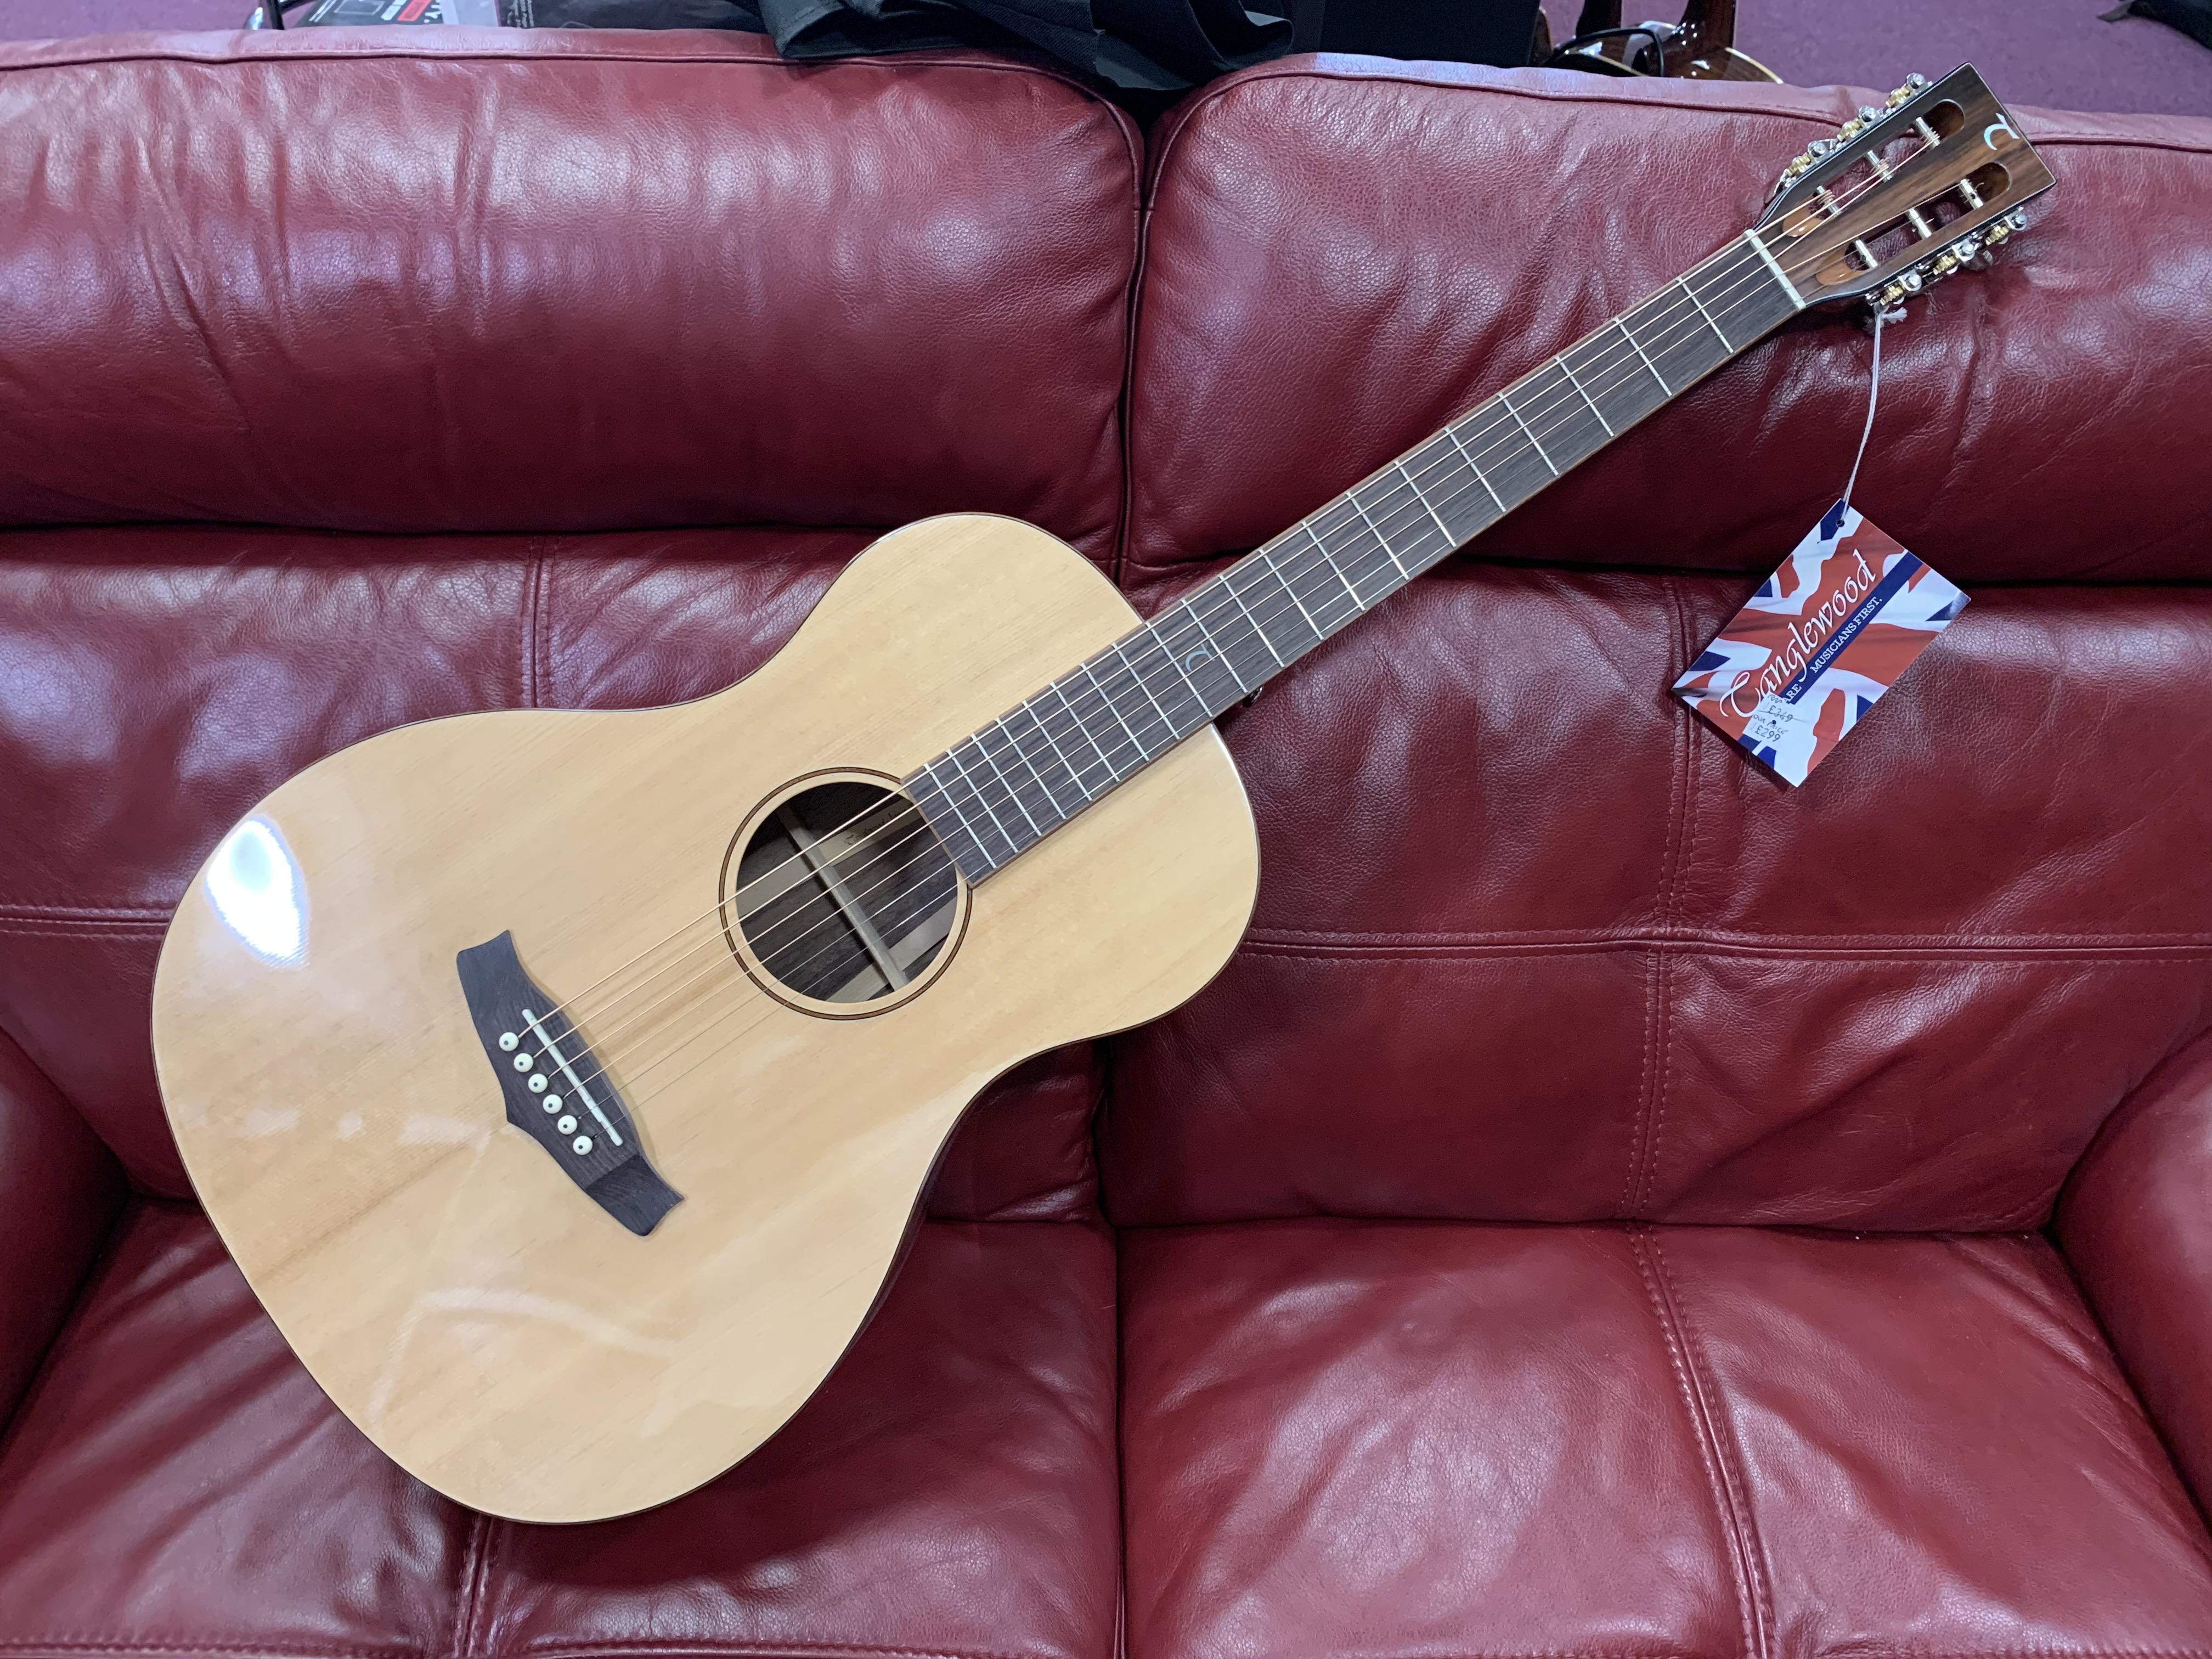 Tanglewood Java TWJP S Electro Acoustic Guitar (RRP £349)